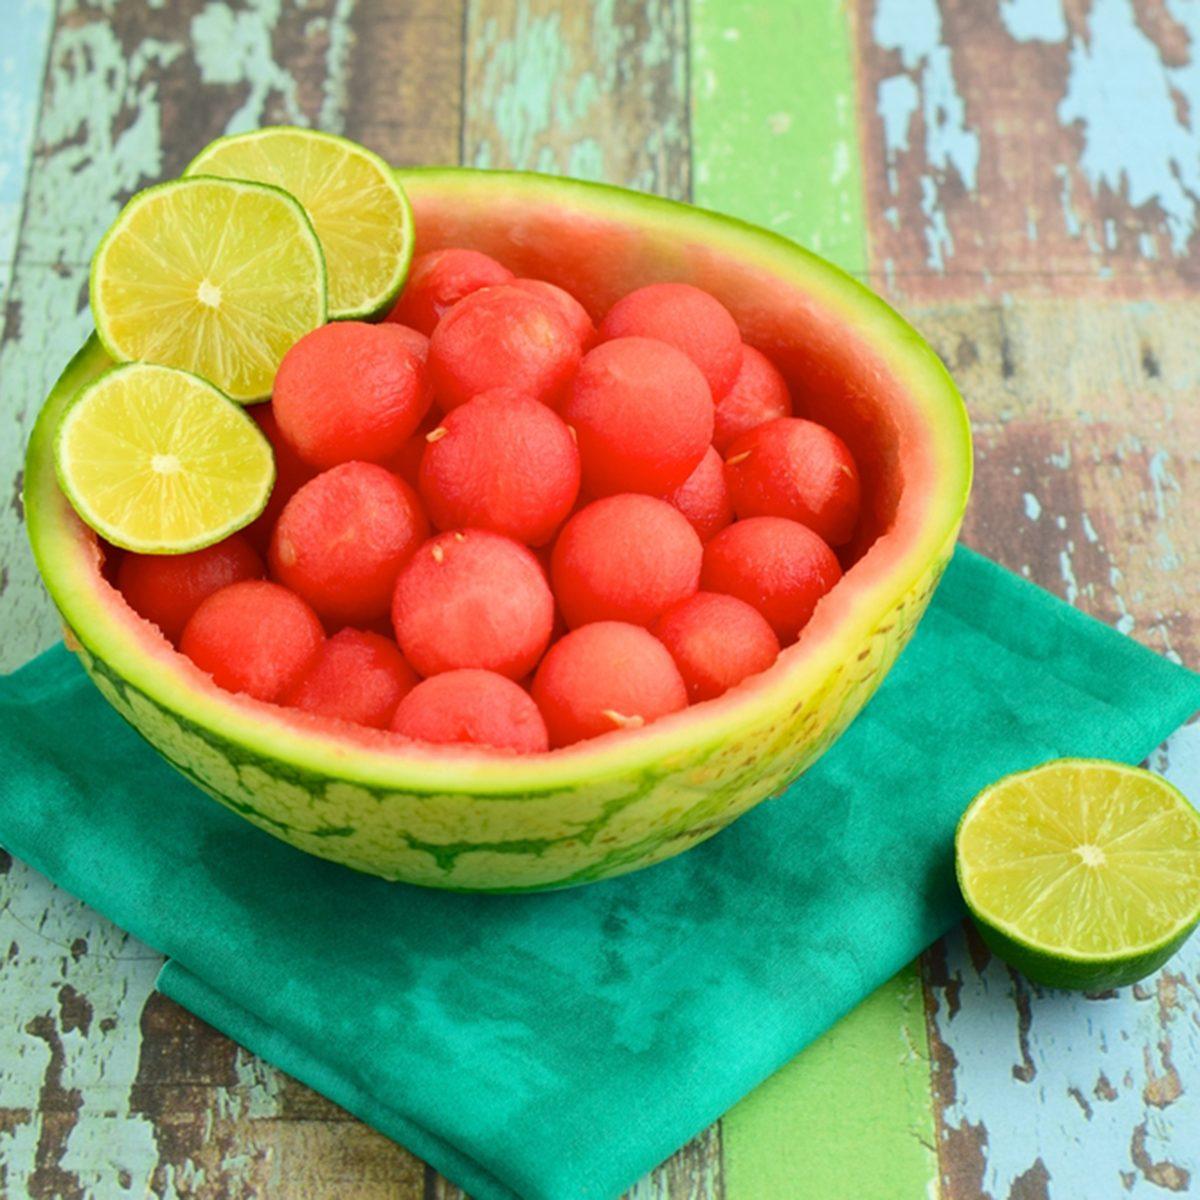 Fruit salad with watermelon balls